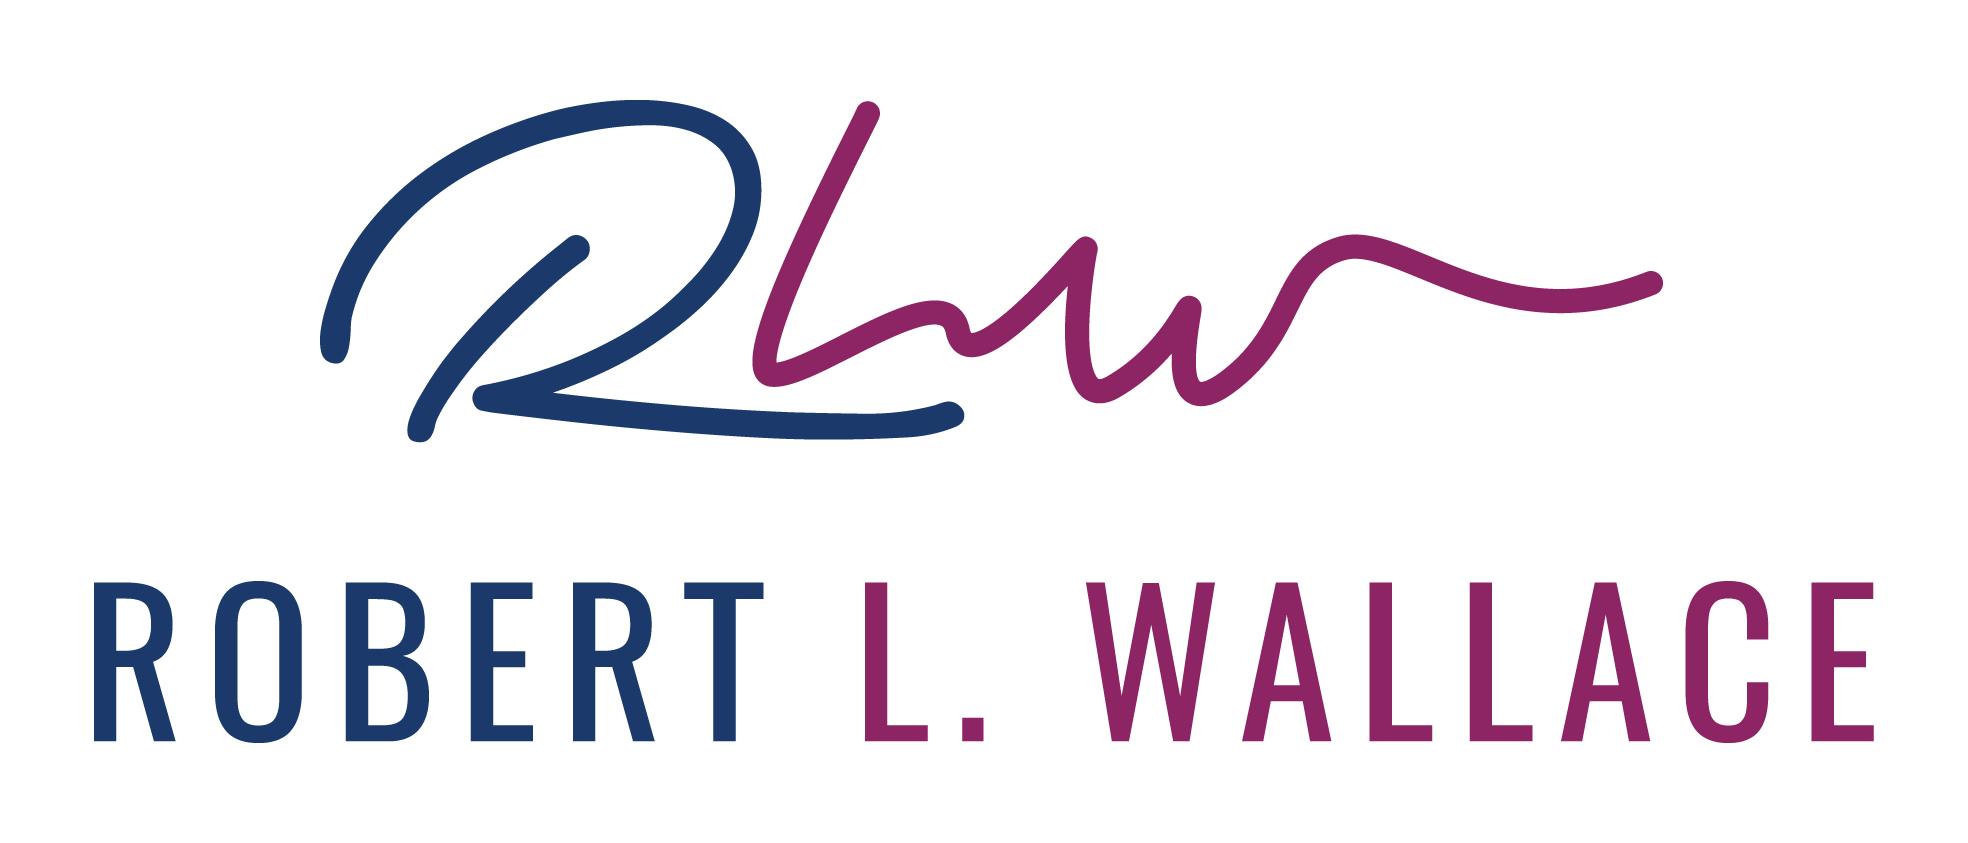 robertwallace_logo.png